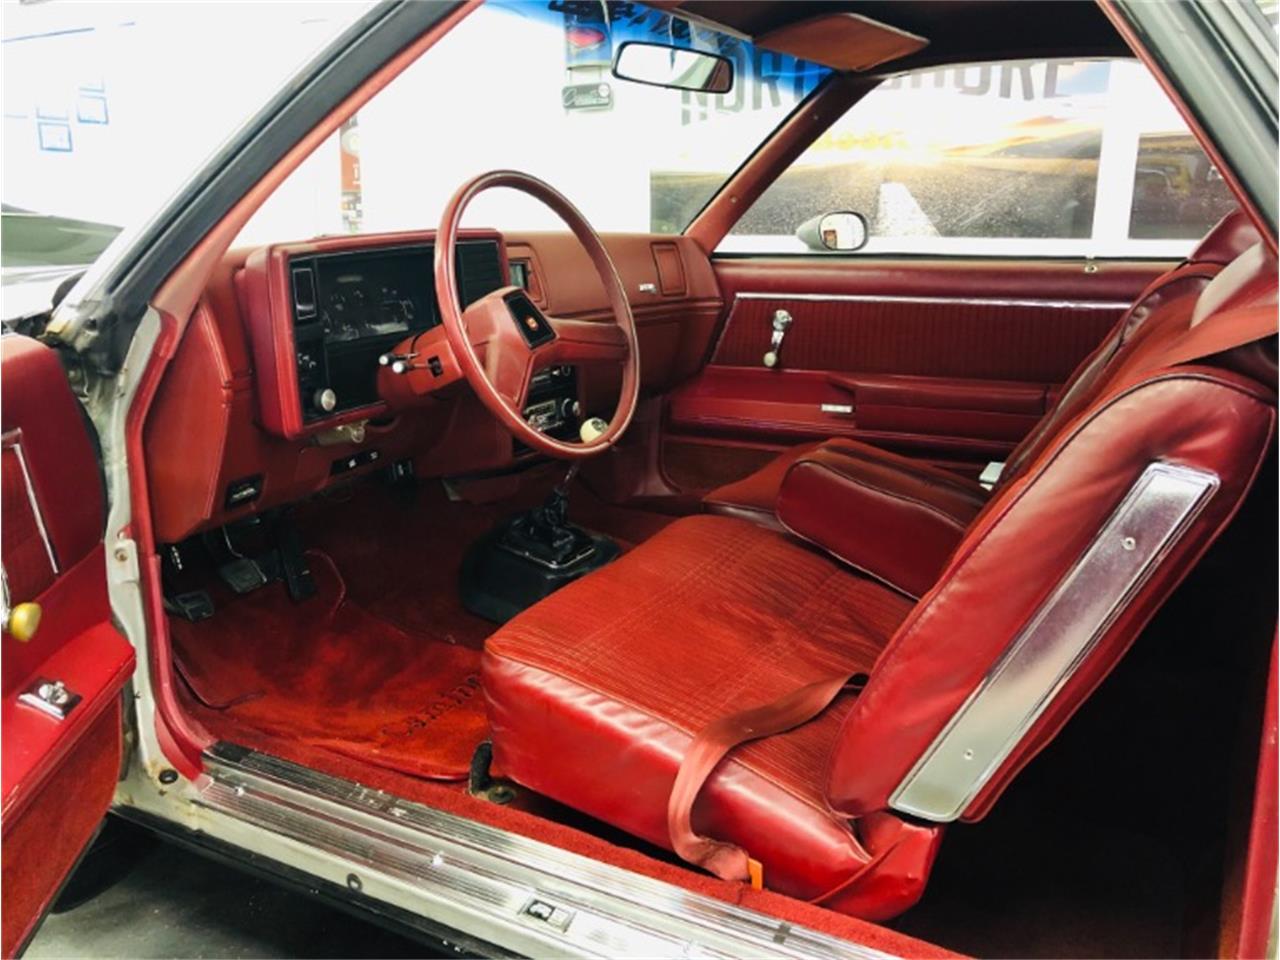 1979 Chevrolet El Camino (CC-1219643) for sale in Mundelein, Illinois